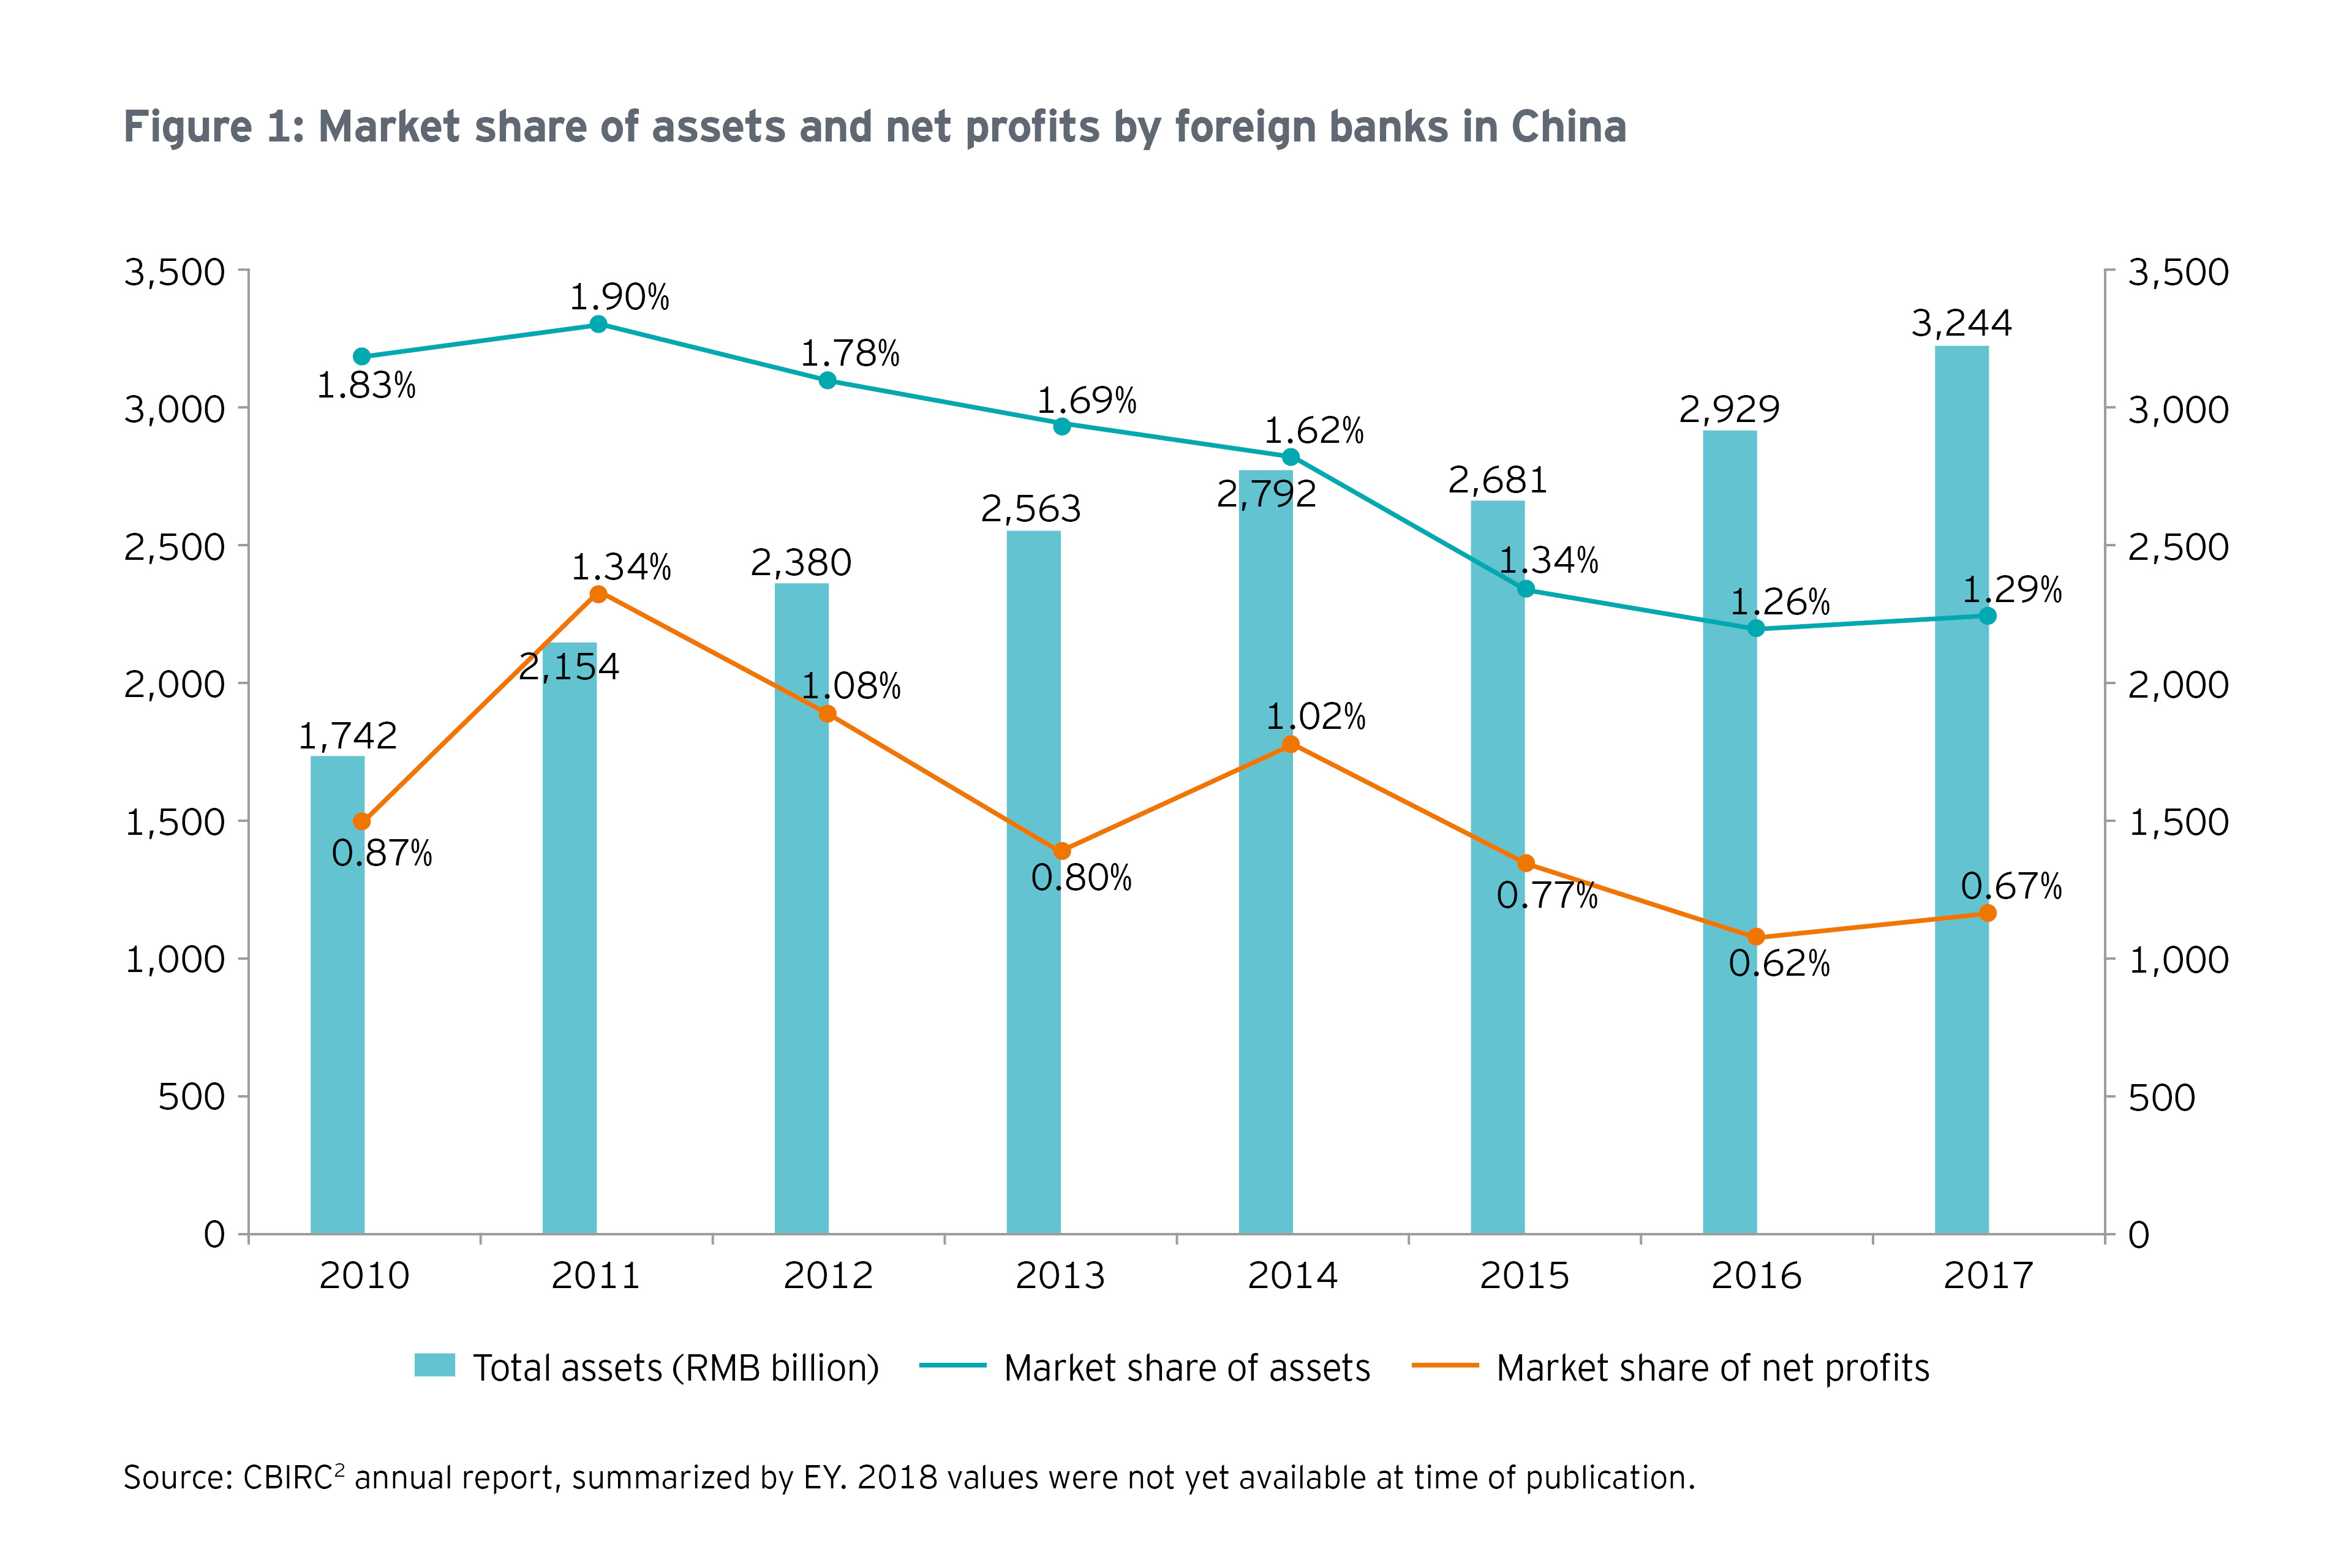 Market share of assets and net profits chart